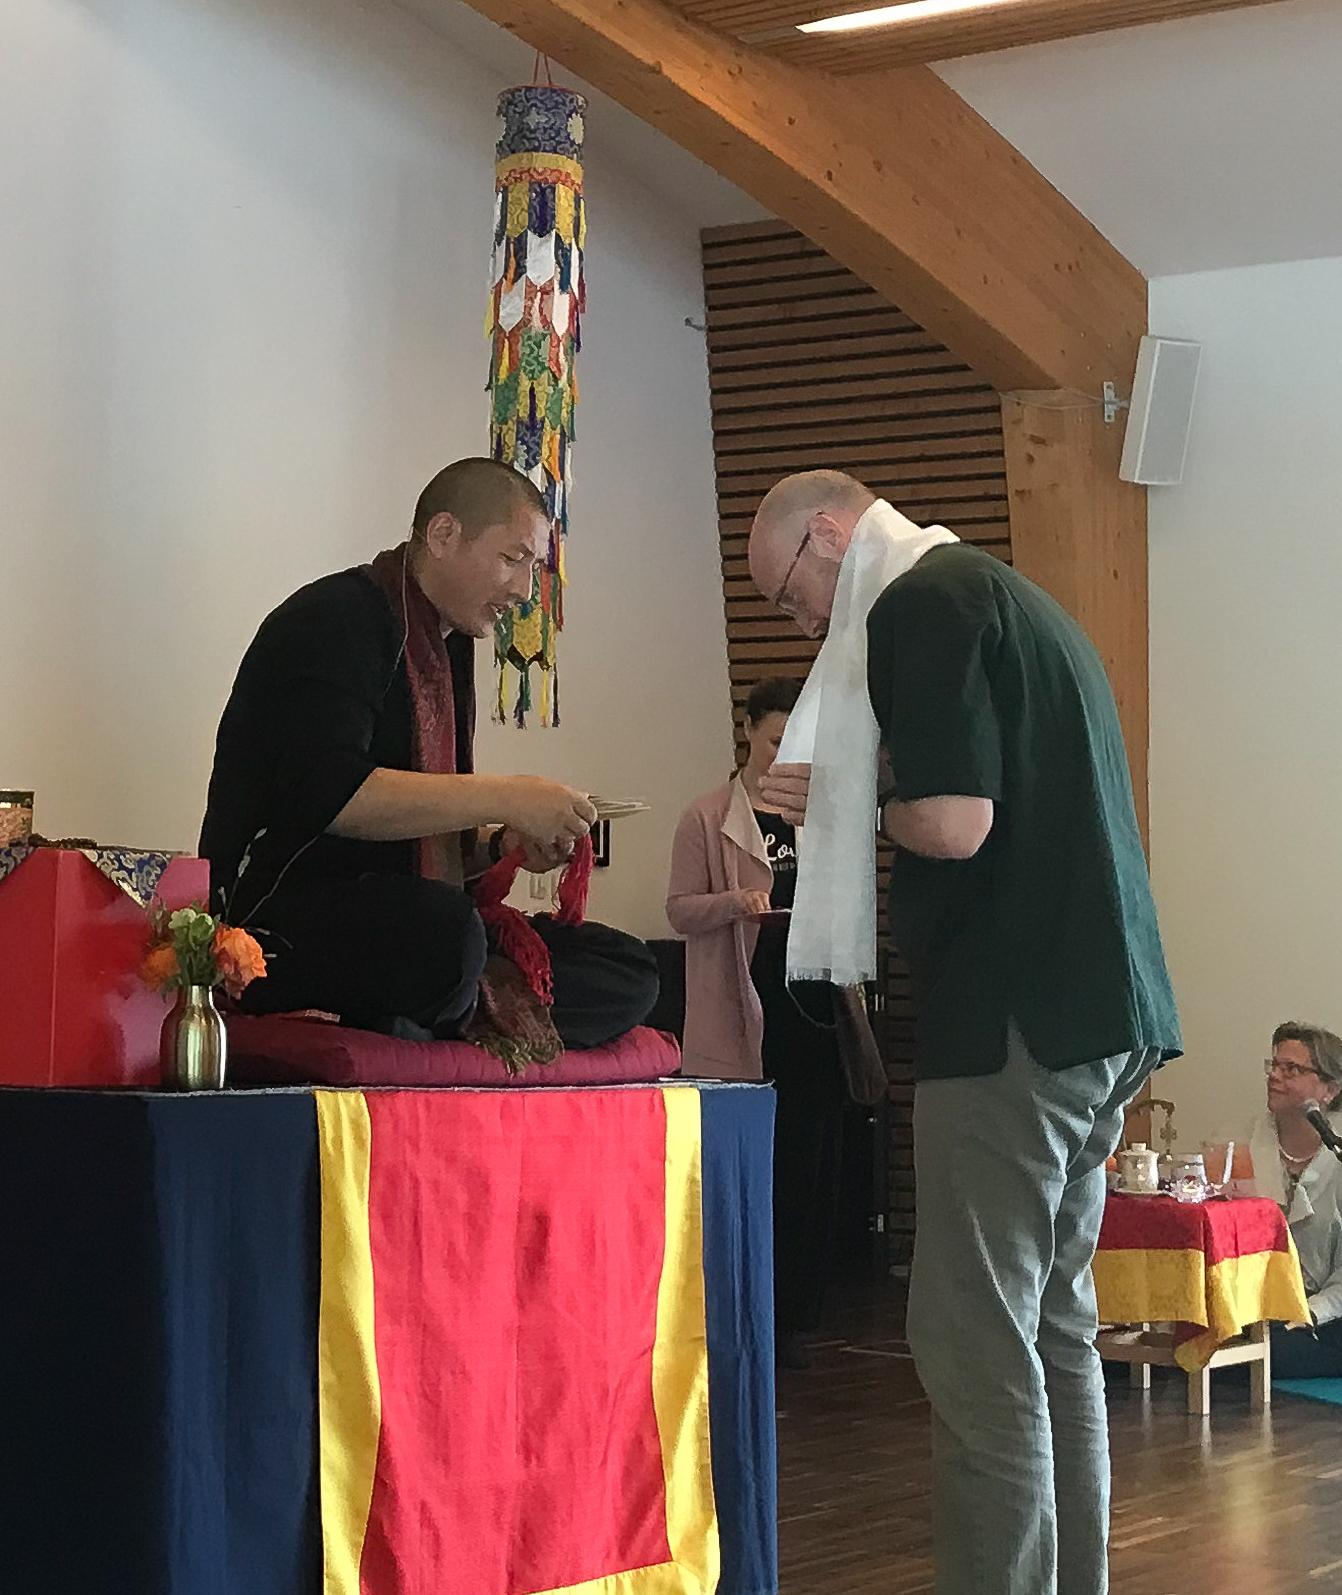 John taking refuge with Tulku Lobsang Rinpoche, May 2019